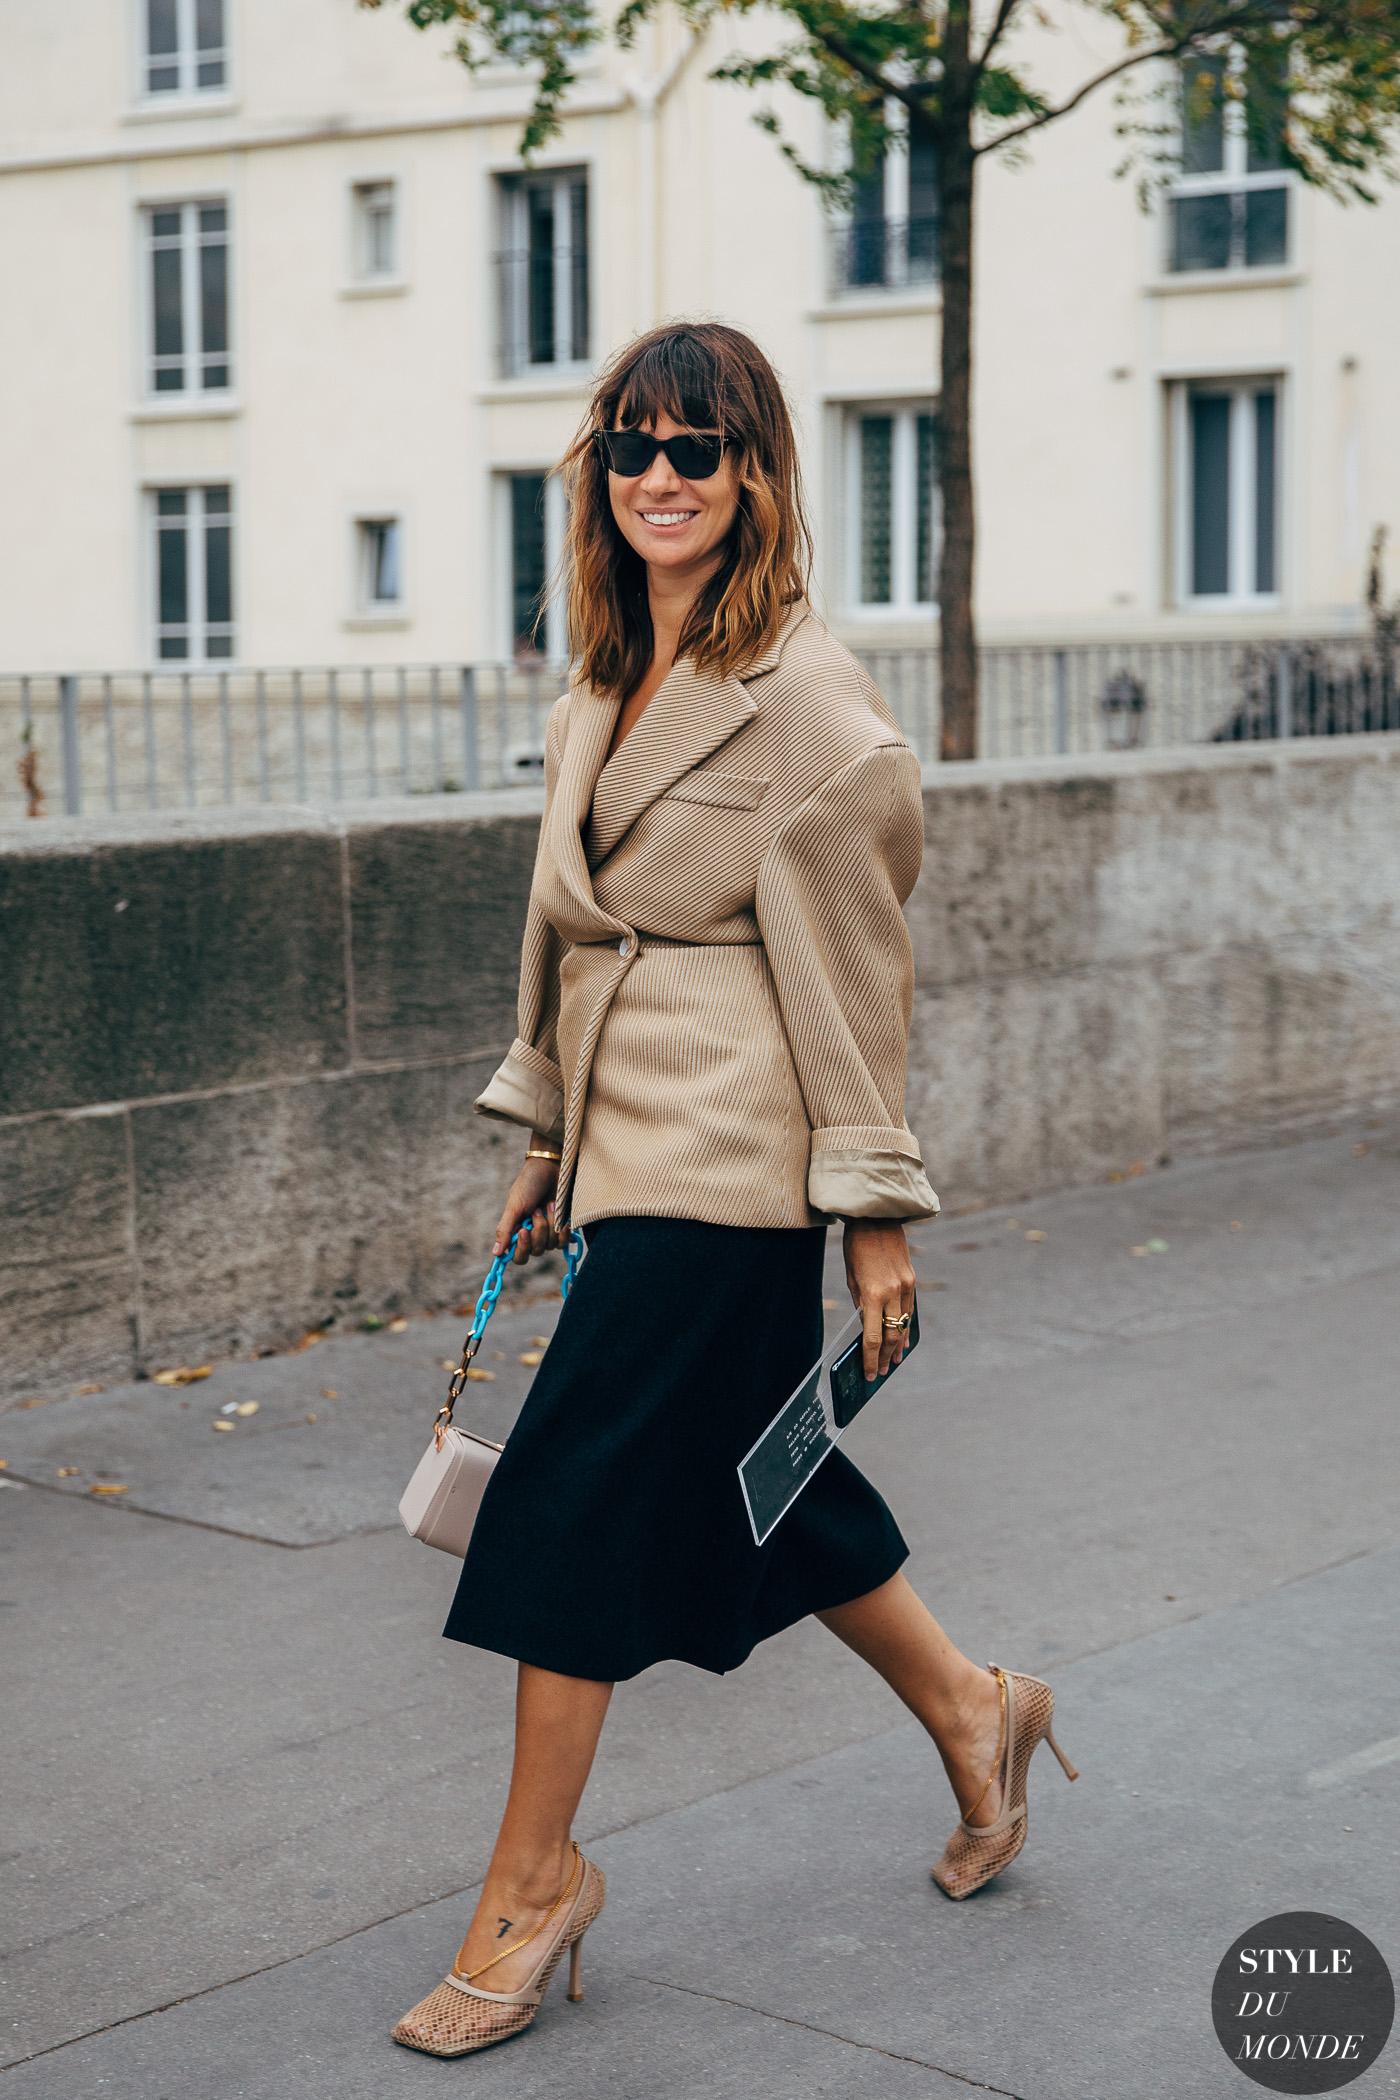 Paris SS 2020 Street Style: Natasha Goldenberg